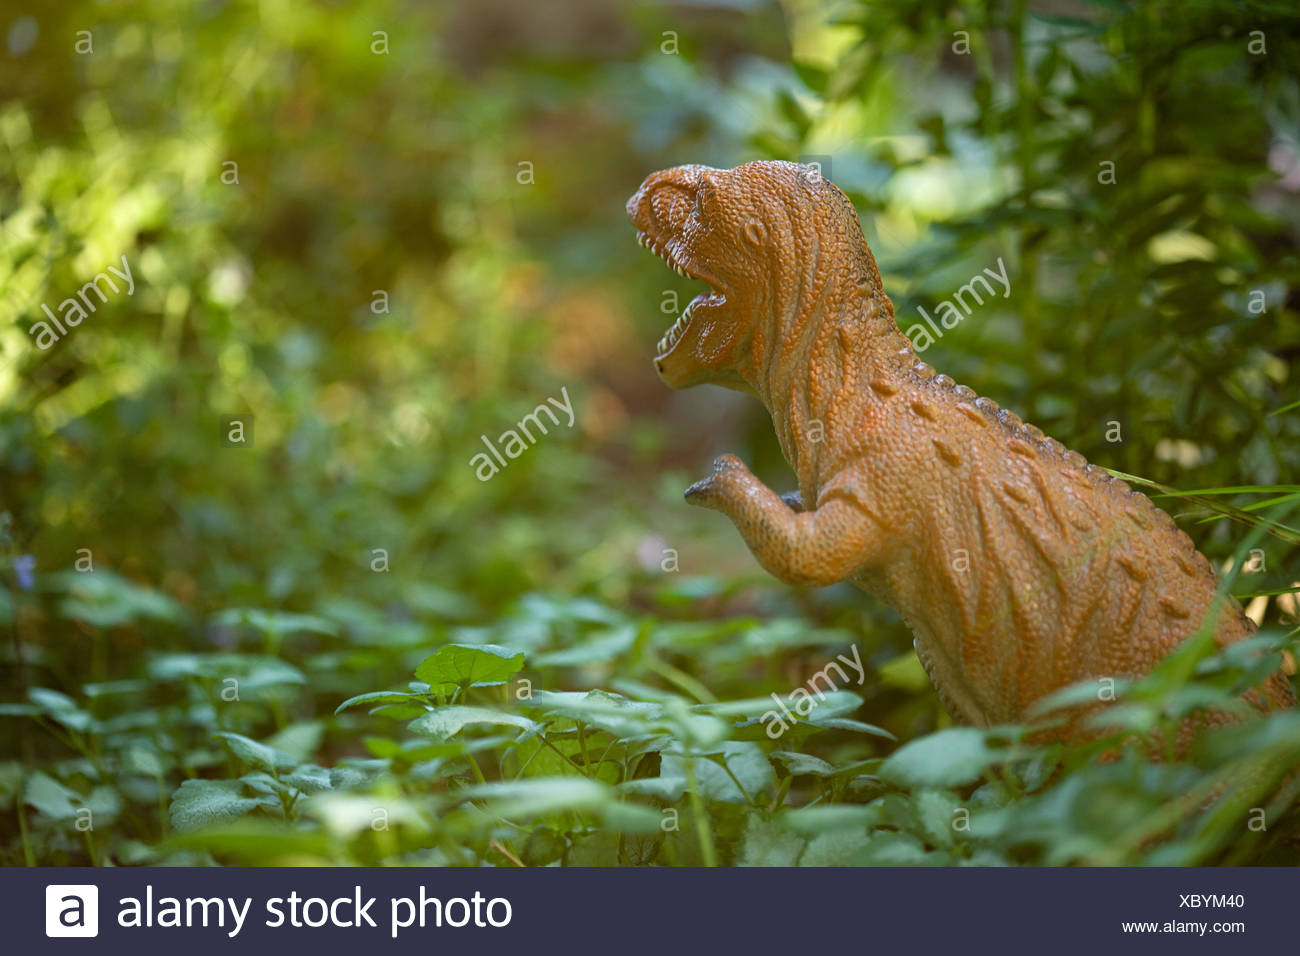 Toy dinosaur - Stock Image